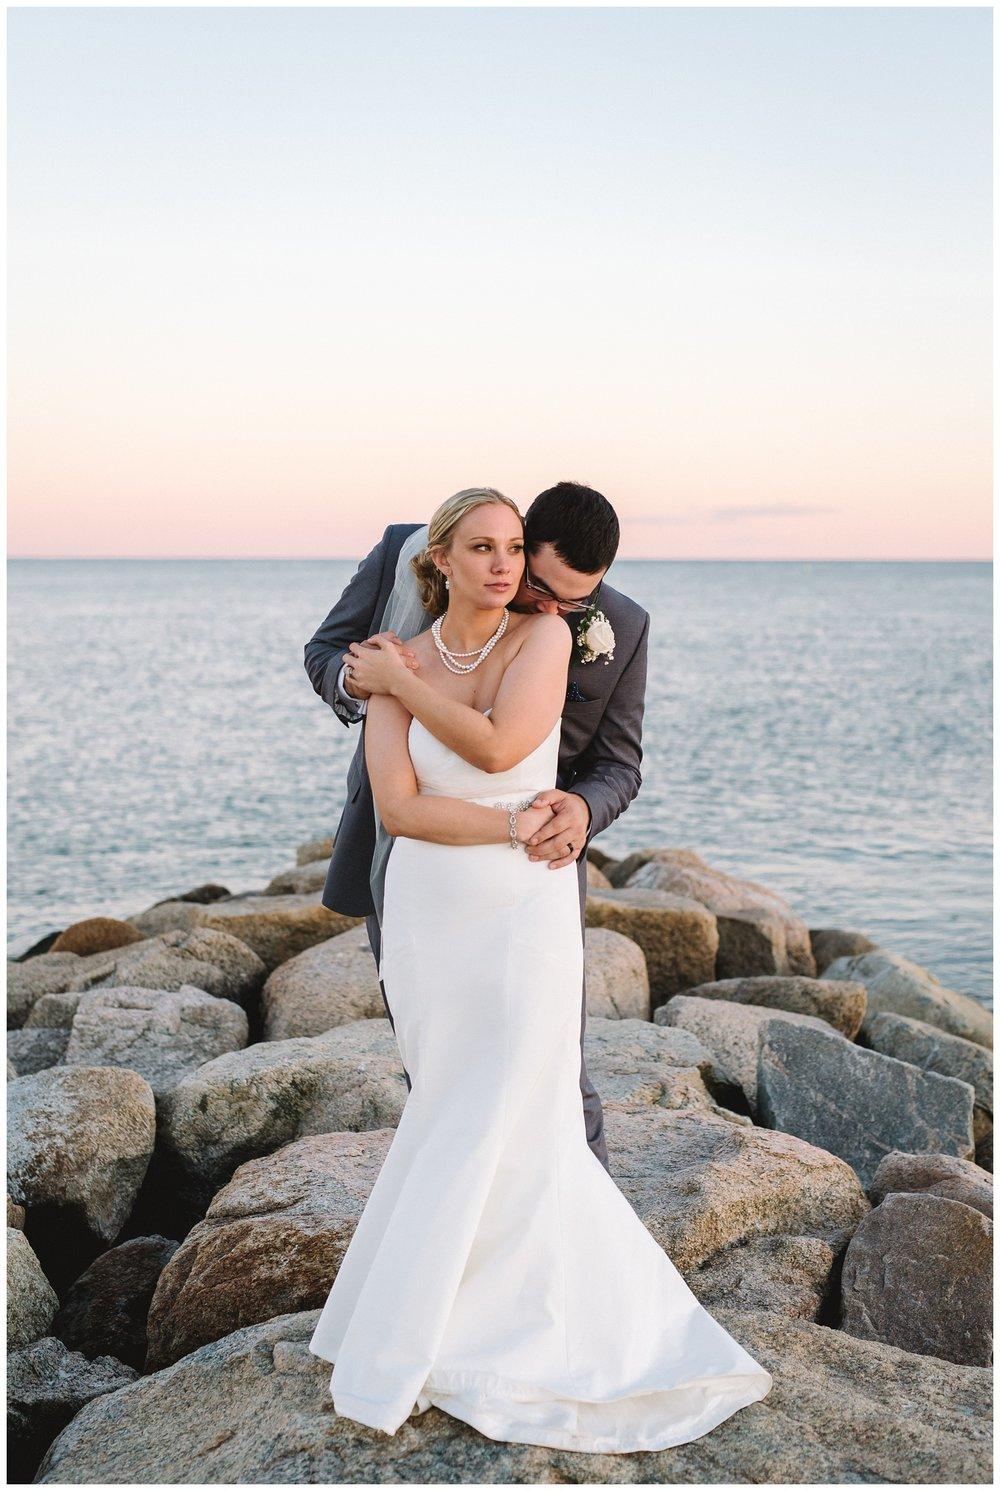 Intimate Cape Cod Beach Wedding Photographer-155.jpg